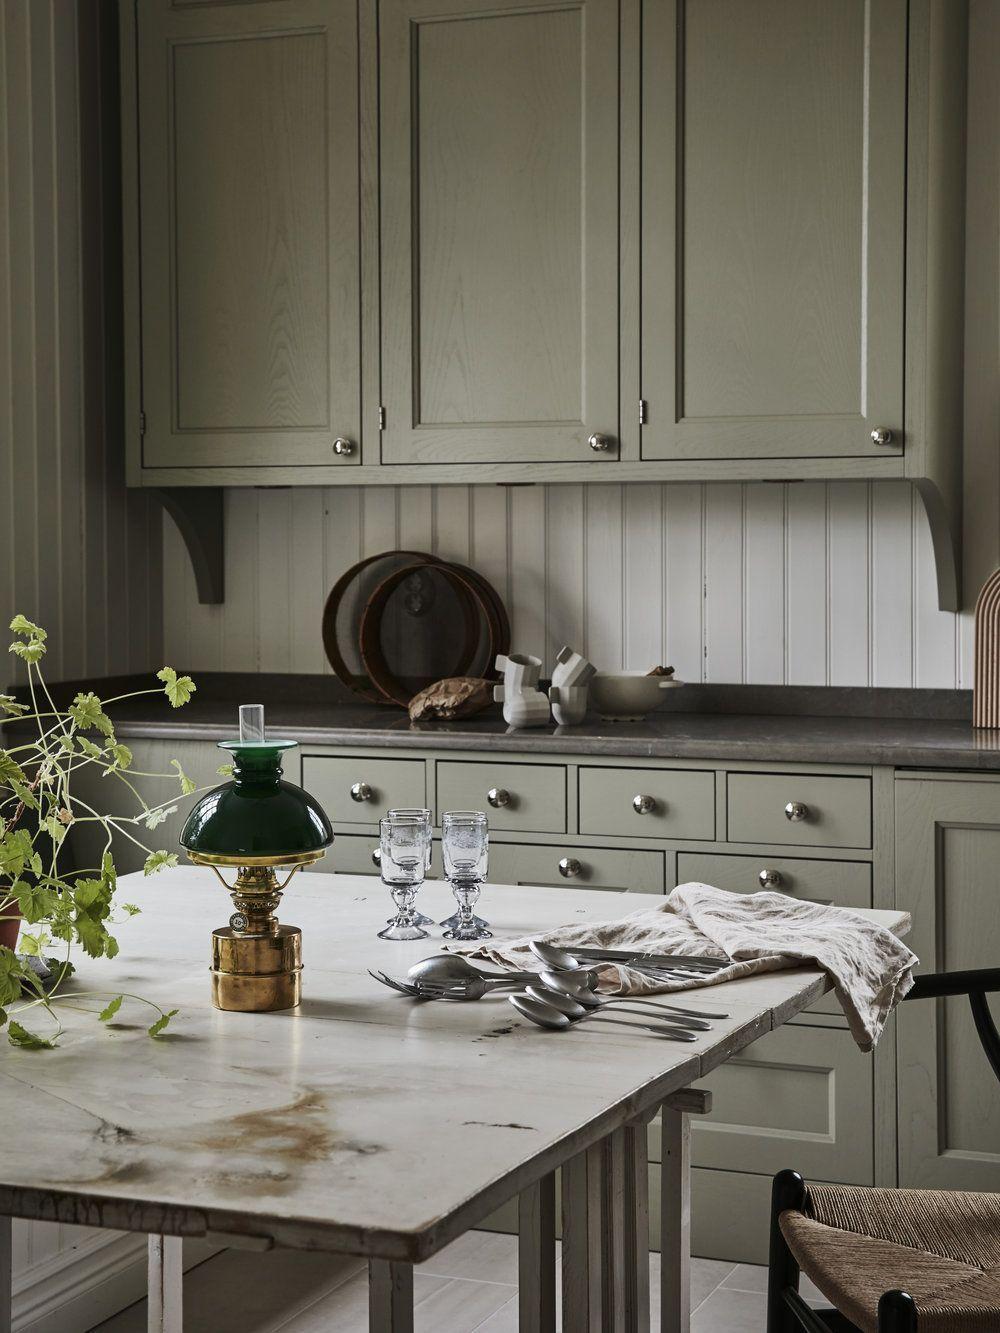 Kitchen sage cabinets white headboard backsplash white table